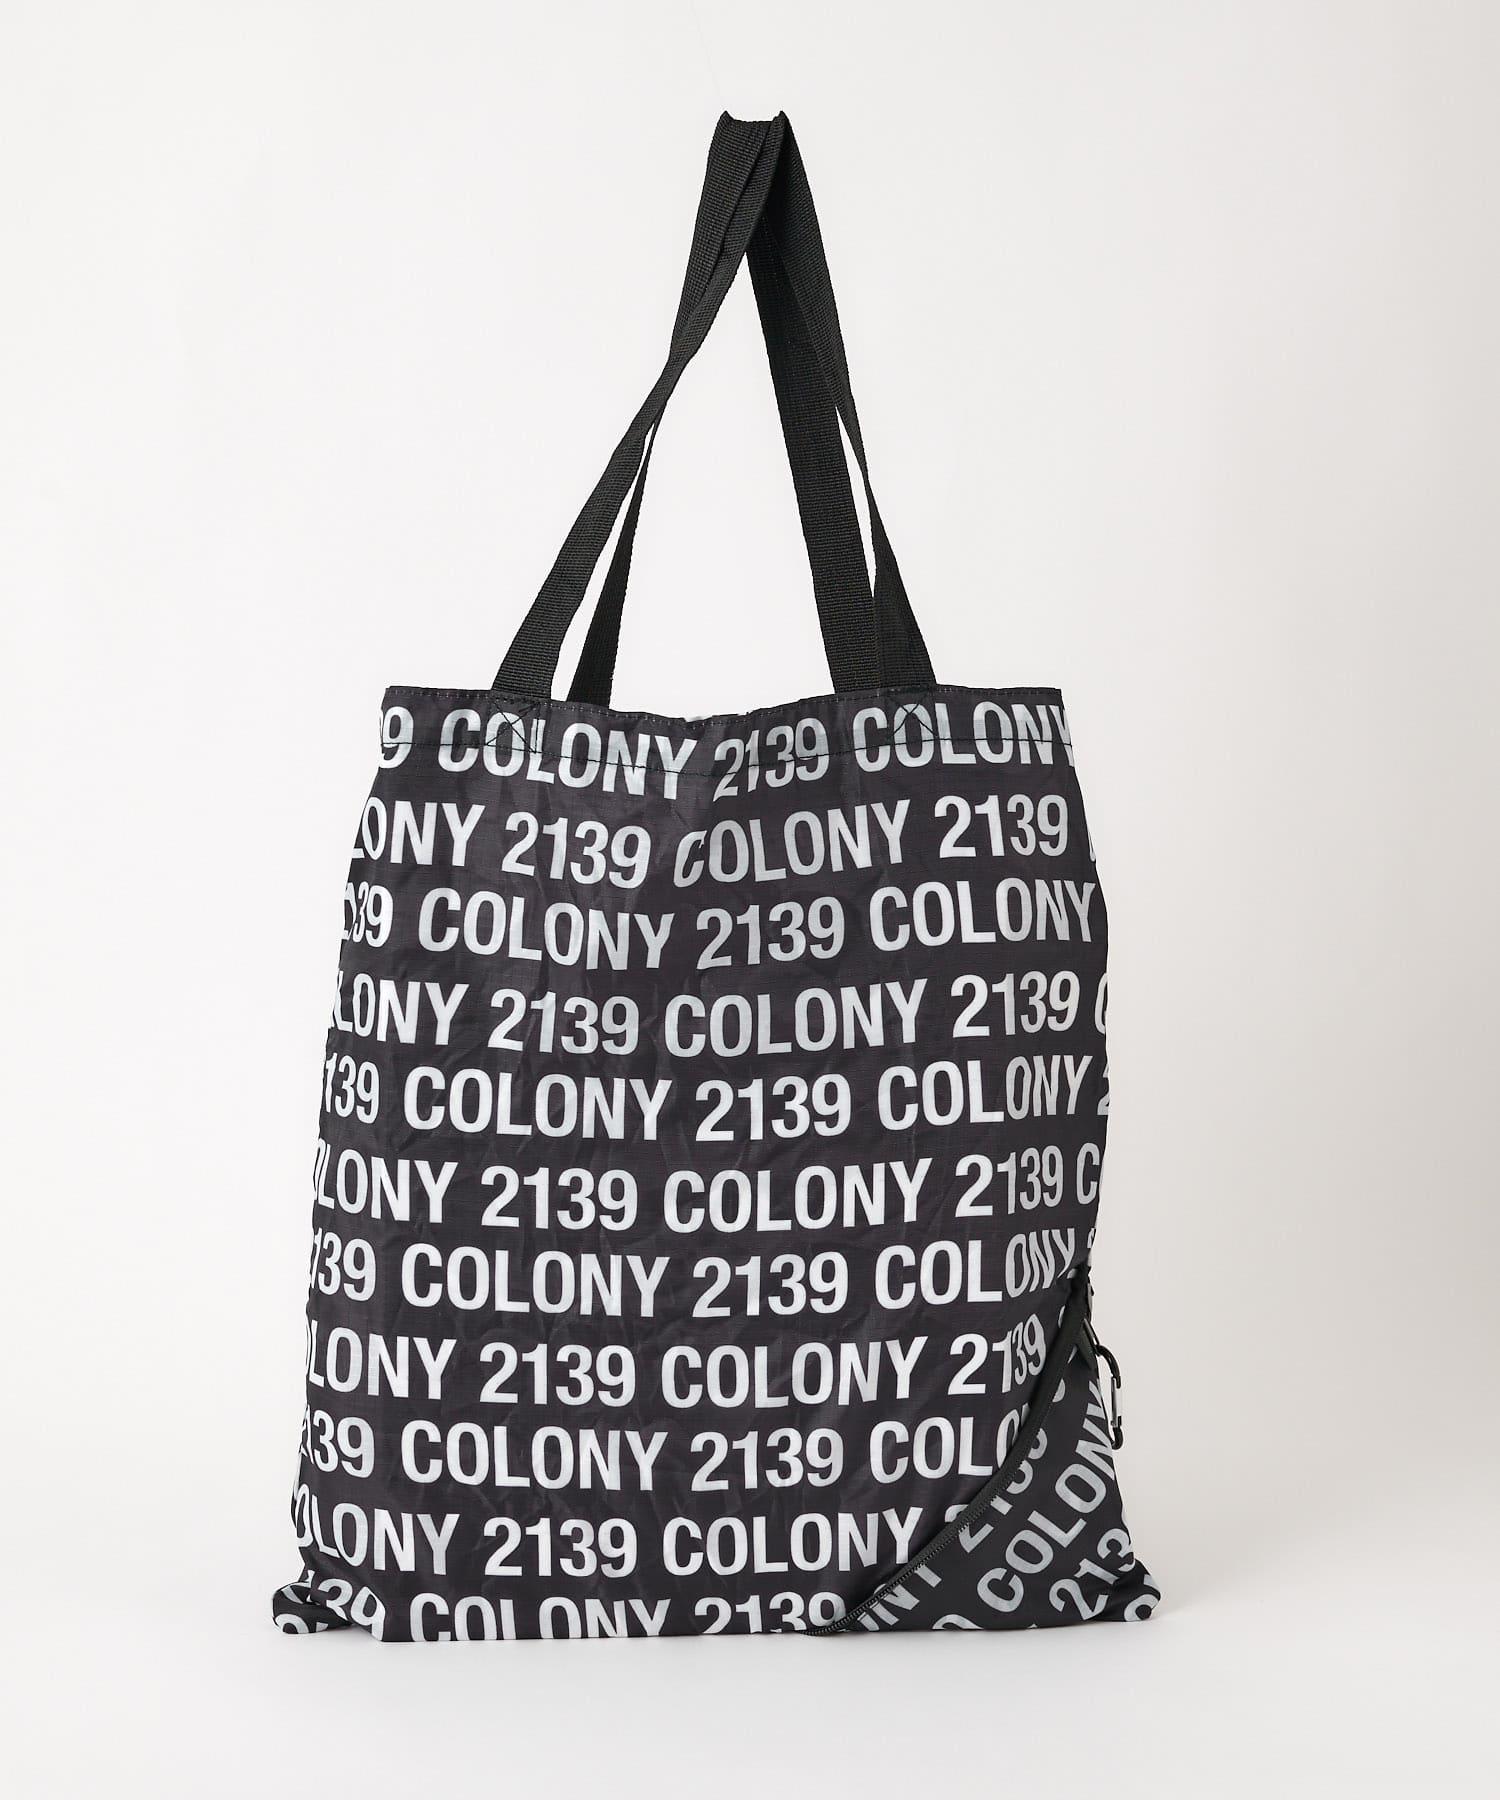 COLONY 2139(コロニー トゥーワンスリーナイン) レディース トライアングルエコバッグ ブラックその他2